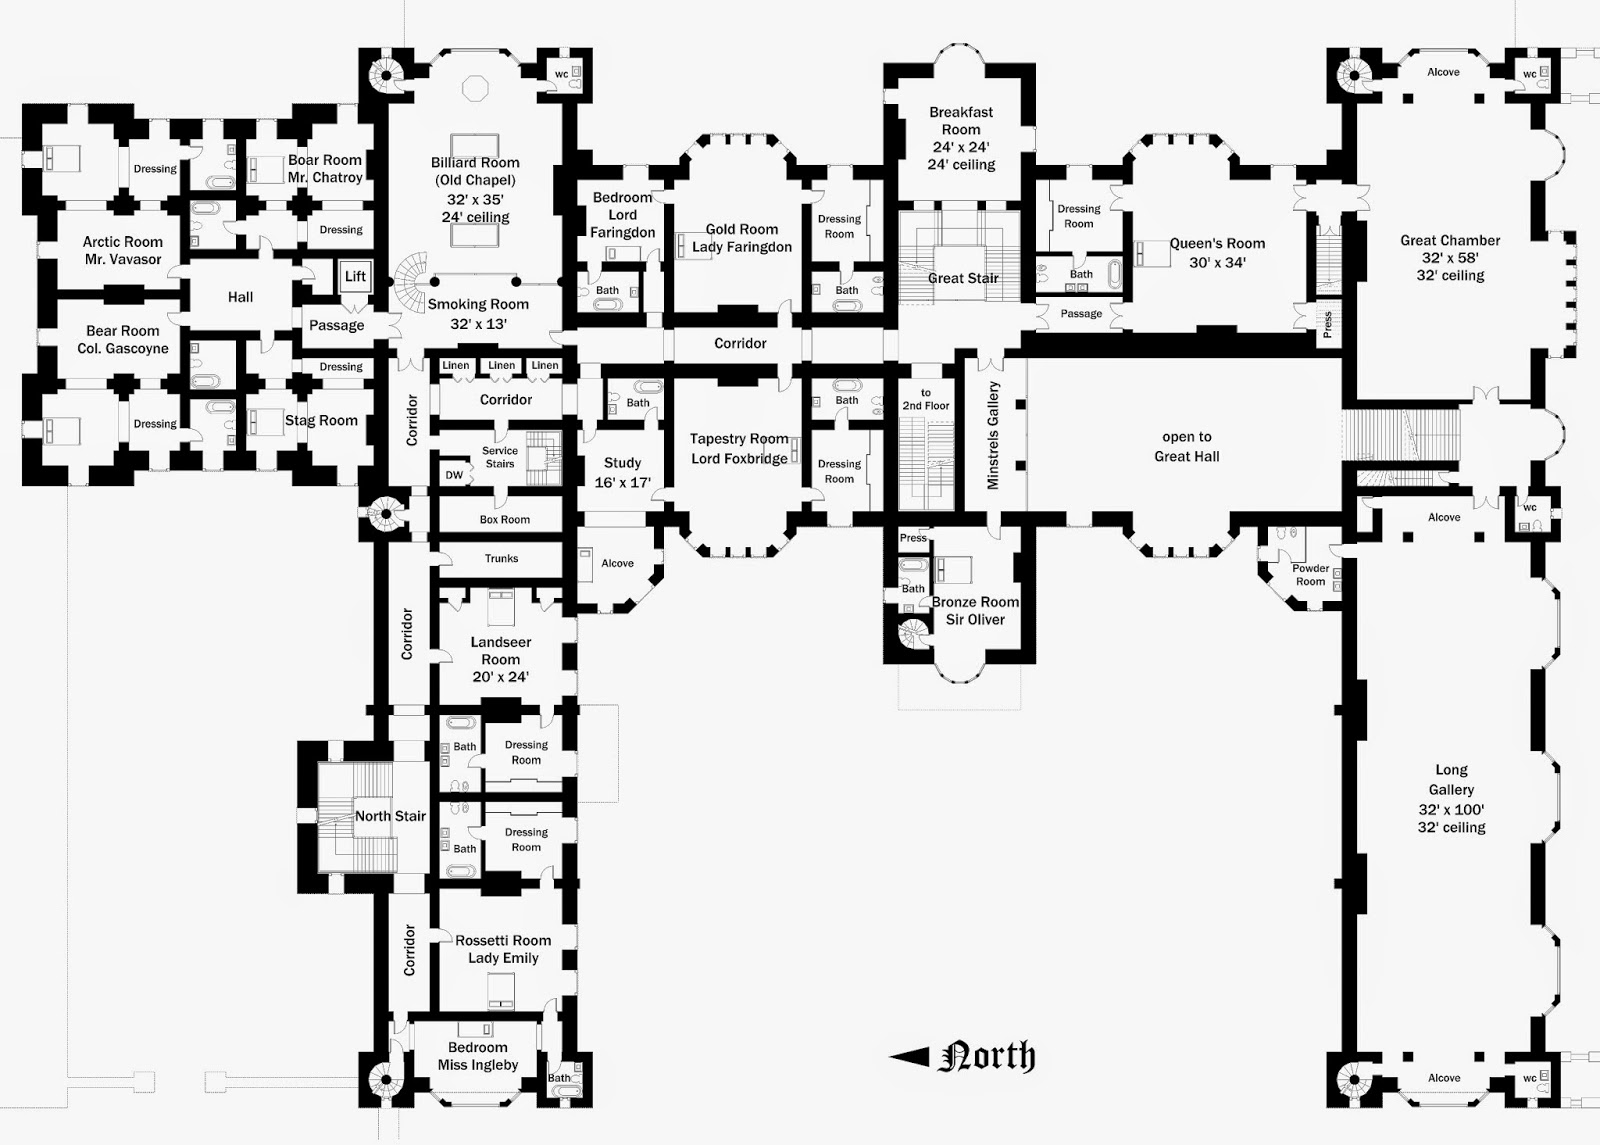 castle howard floor plan valine trend home design and decor floor plan of castle howard england trend home design